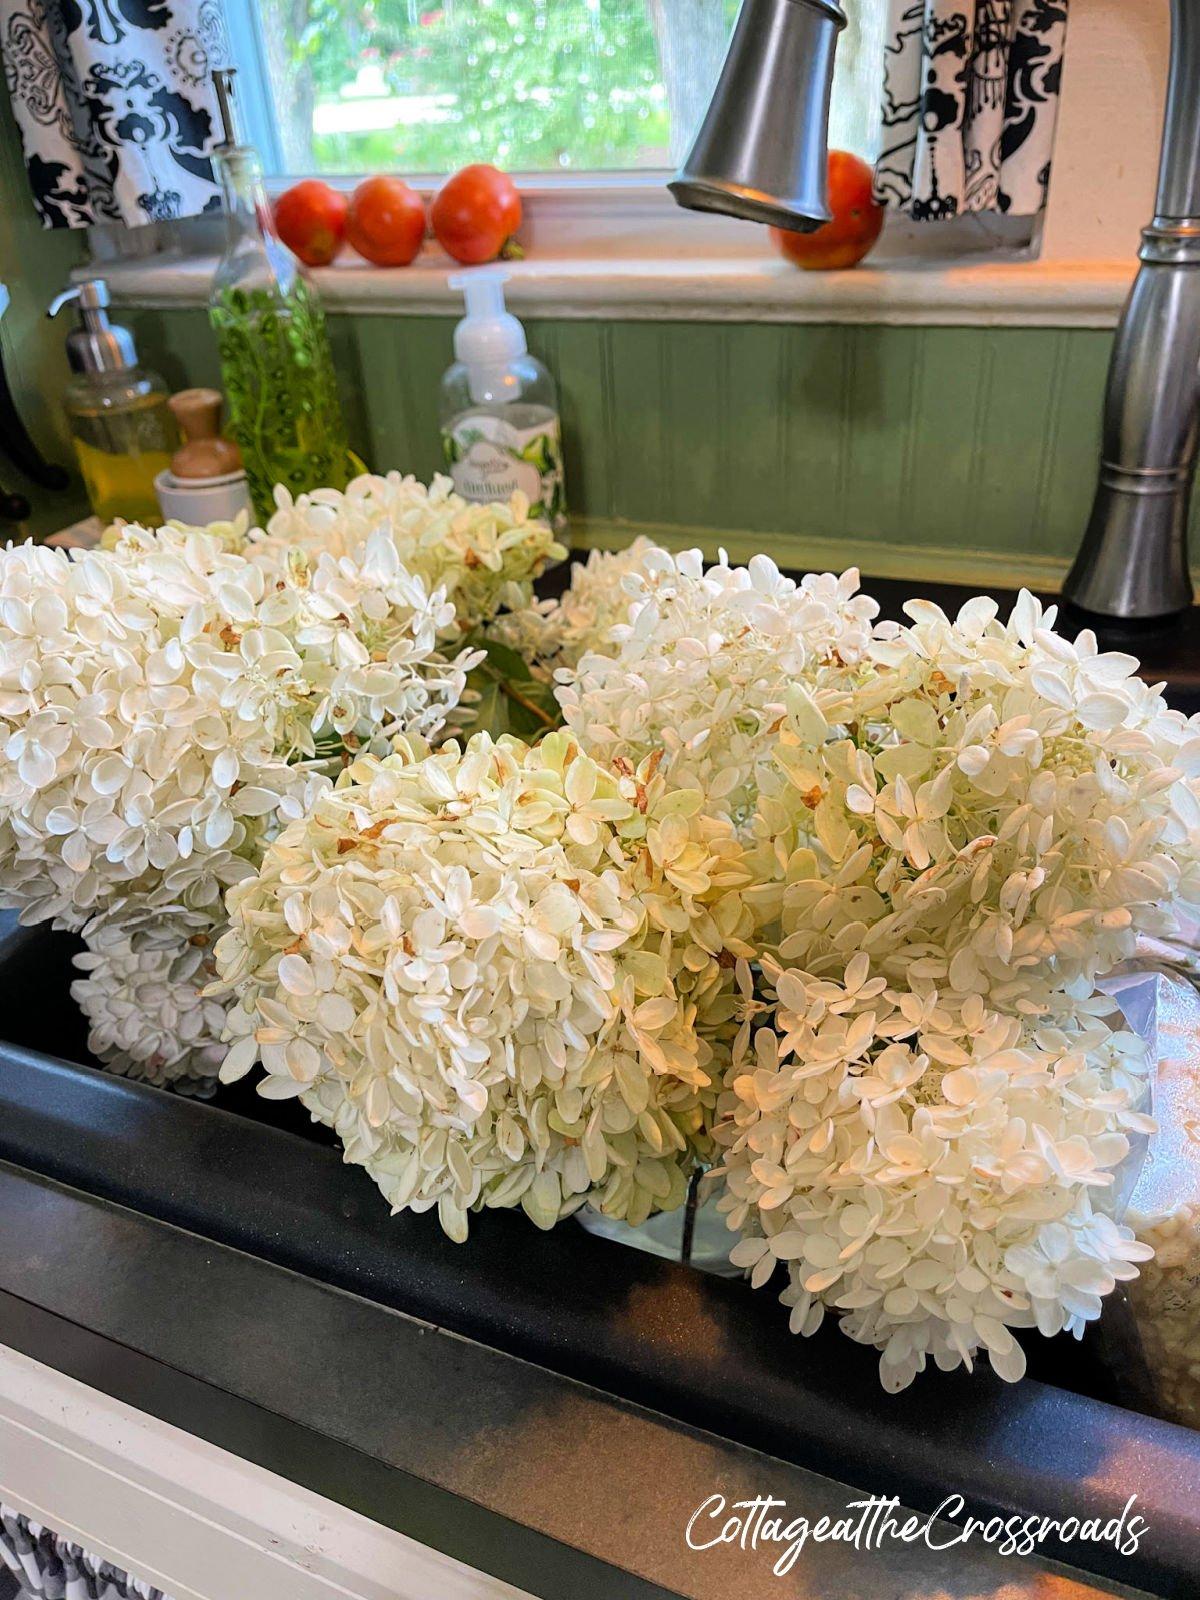 white hydrangea blooms in the sink